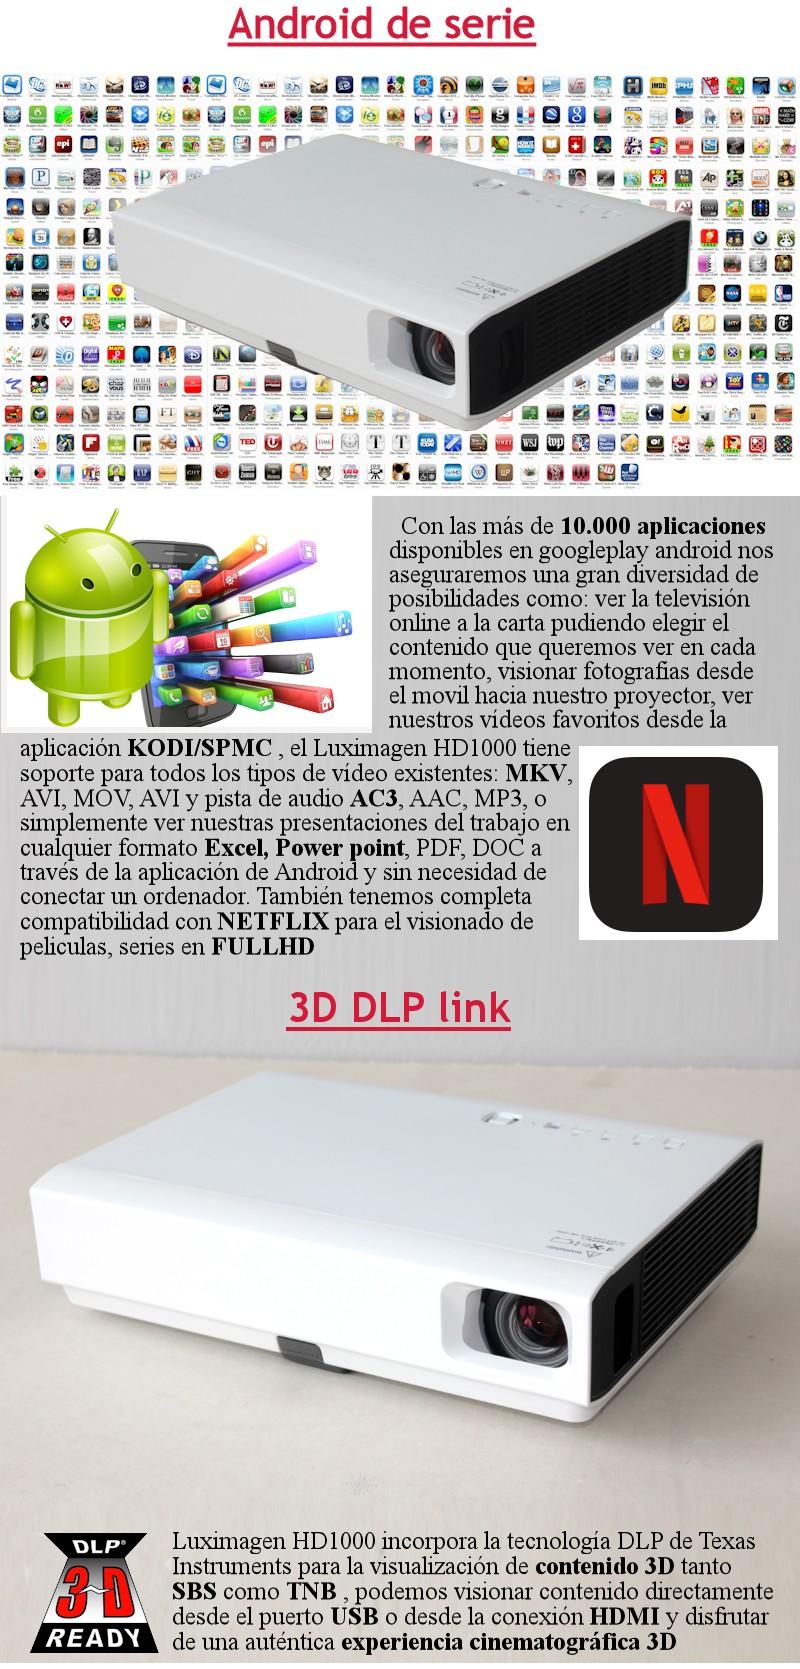 Proyector barato compatible con MKV, AC3, AVI, DIVX, XVID, MPEG